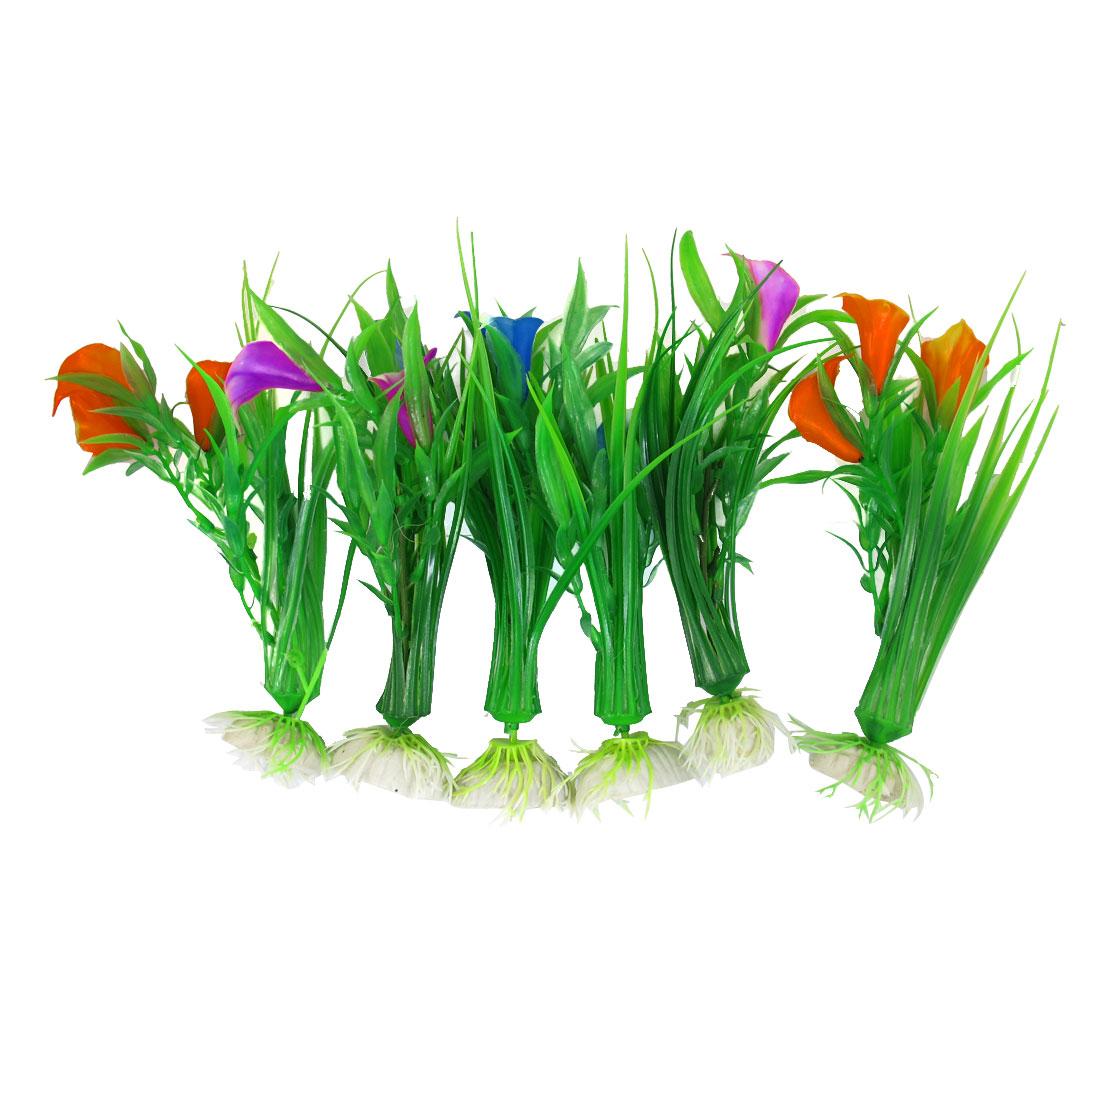 6 Pcs Green Linear Leaf Calla Lily Flower Simulation Aquatic Plant Ornament